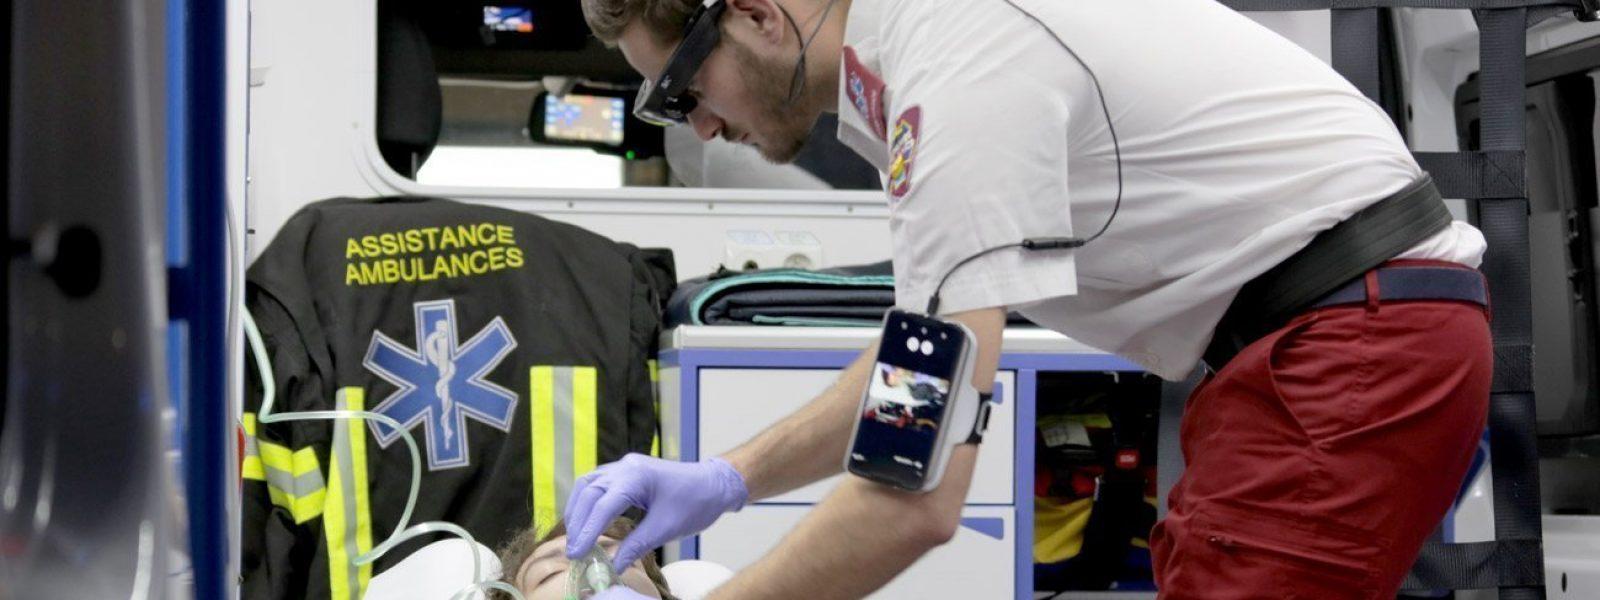 E-health: a focus on technologies